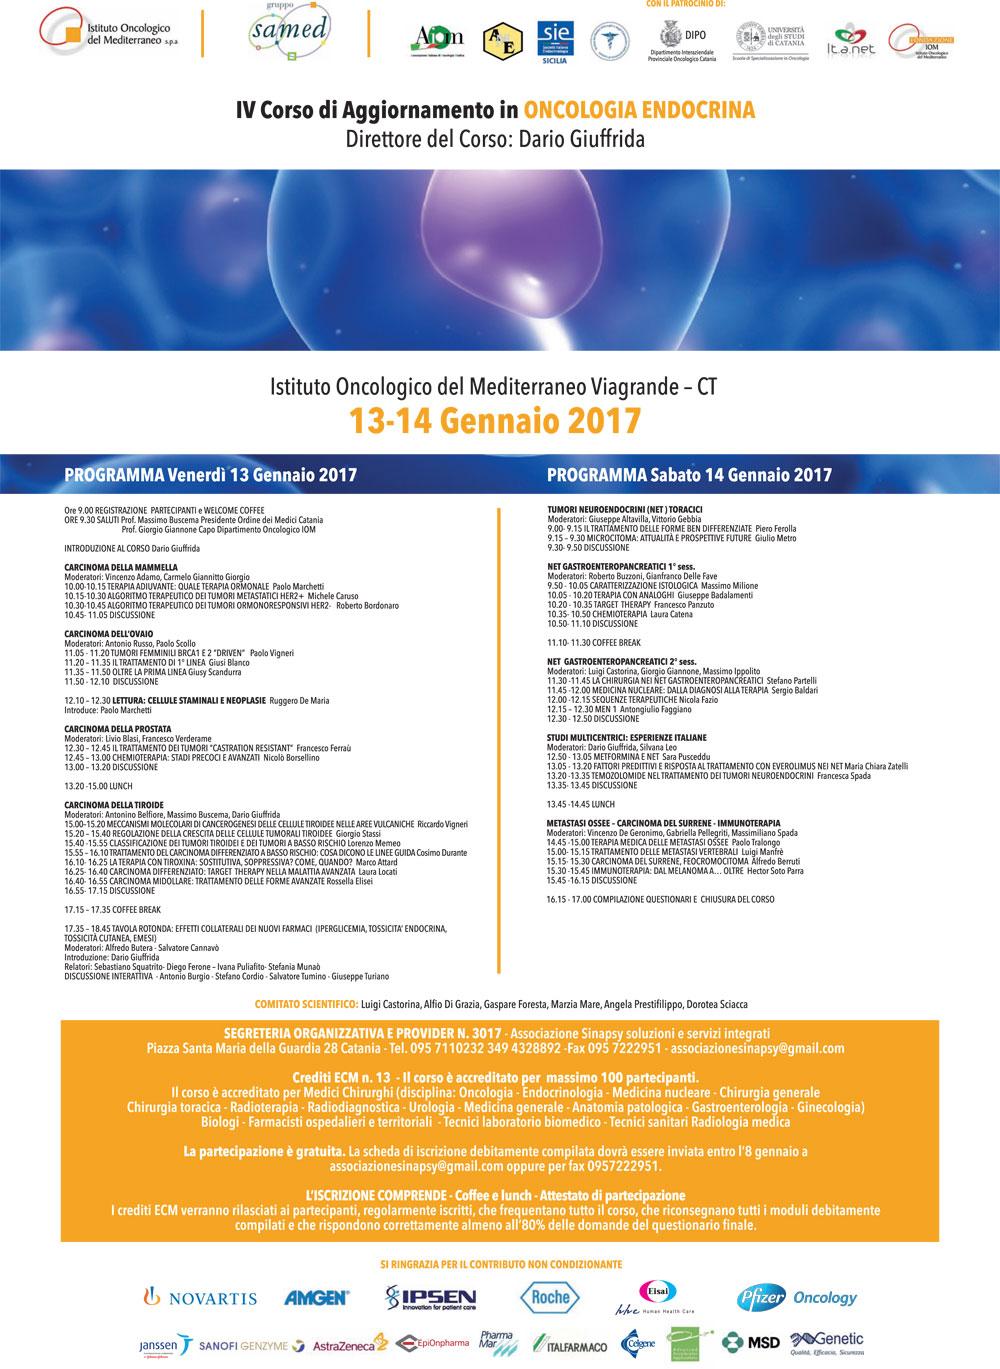 Programma Oncologia Endocrina